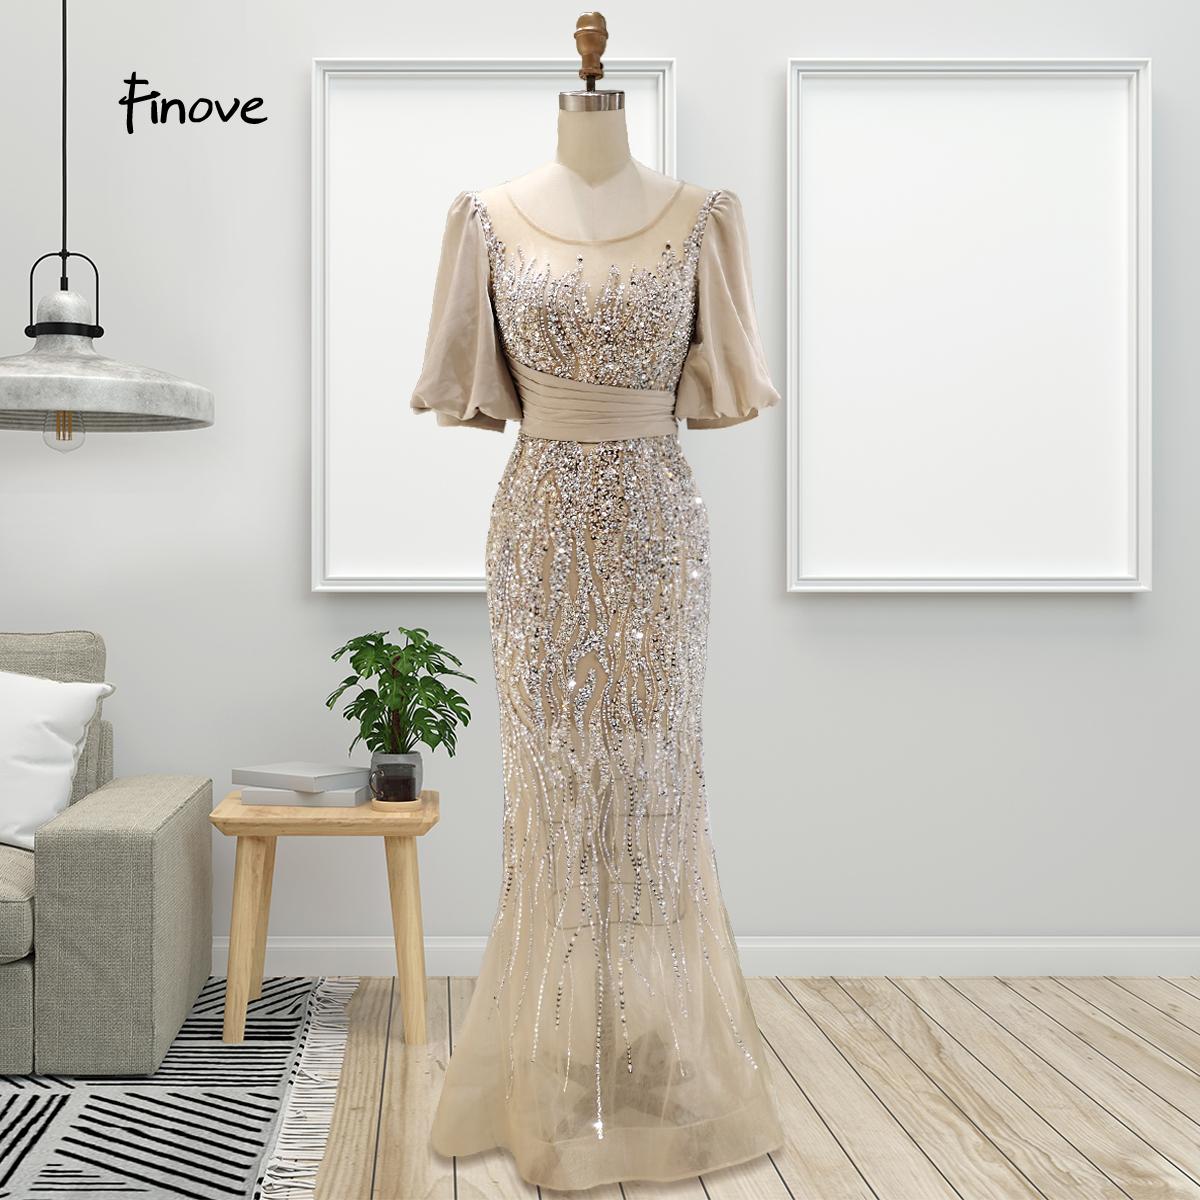 Finove Luxury Champagne Evening Dresses 2021 Elegant O Neck Half Sleeves Beading Mermaid Dresses Formal Evening Gowns